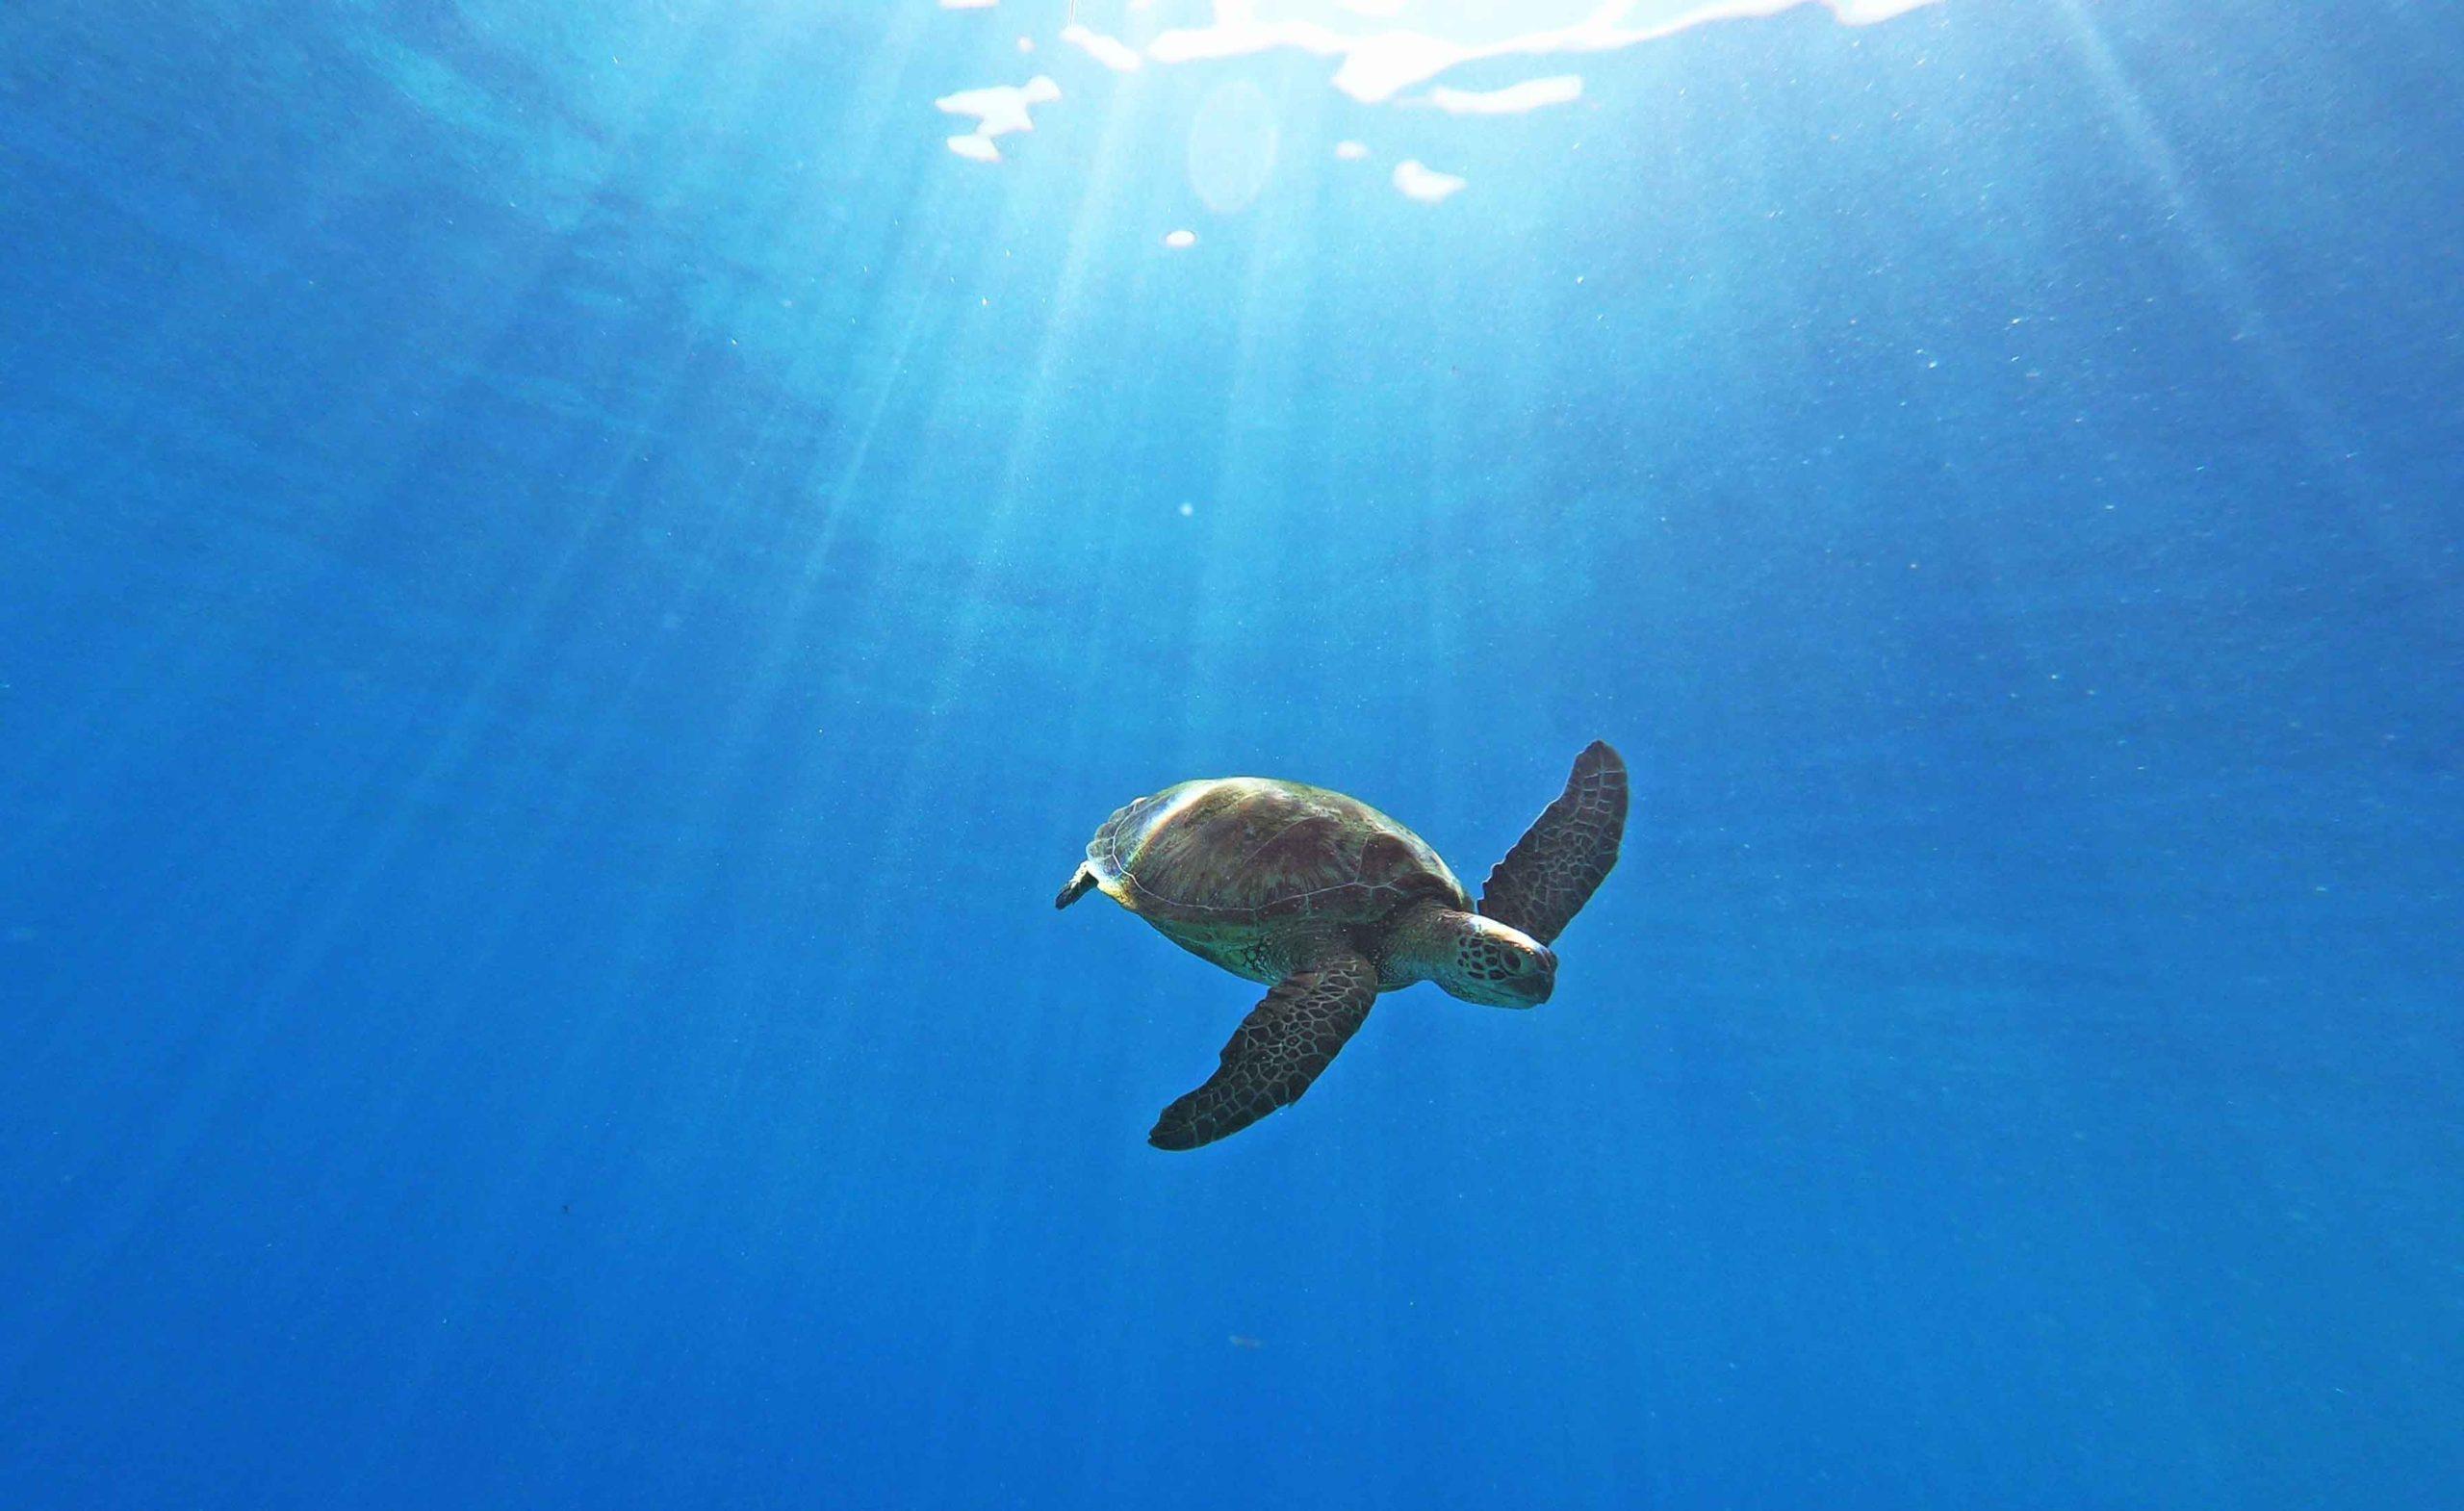 Hawksbill and Green Seaturtles Moorea Tahiti Snorkeling Tour Swim with turtles Private Boat Ocean Adventures